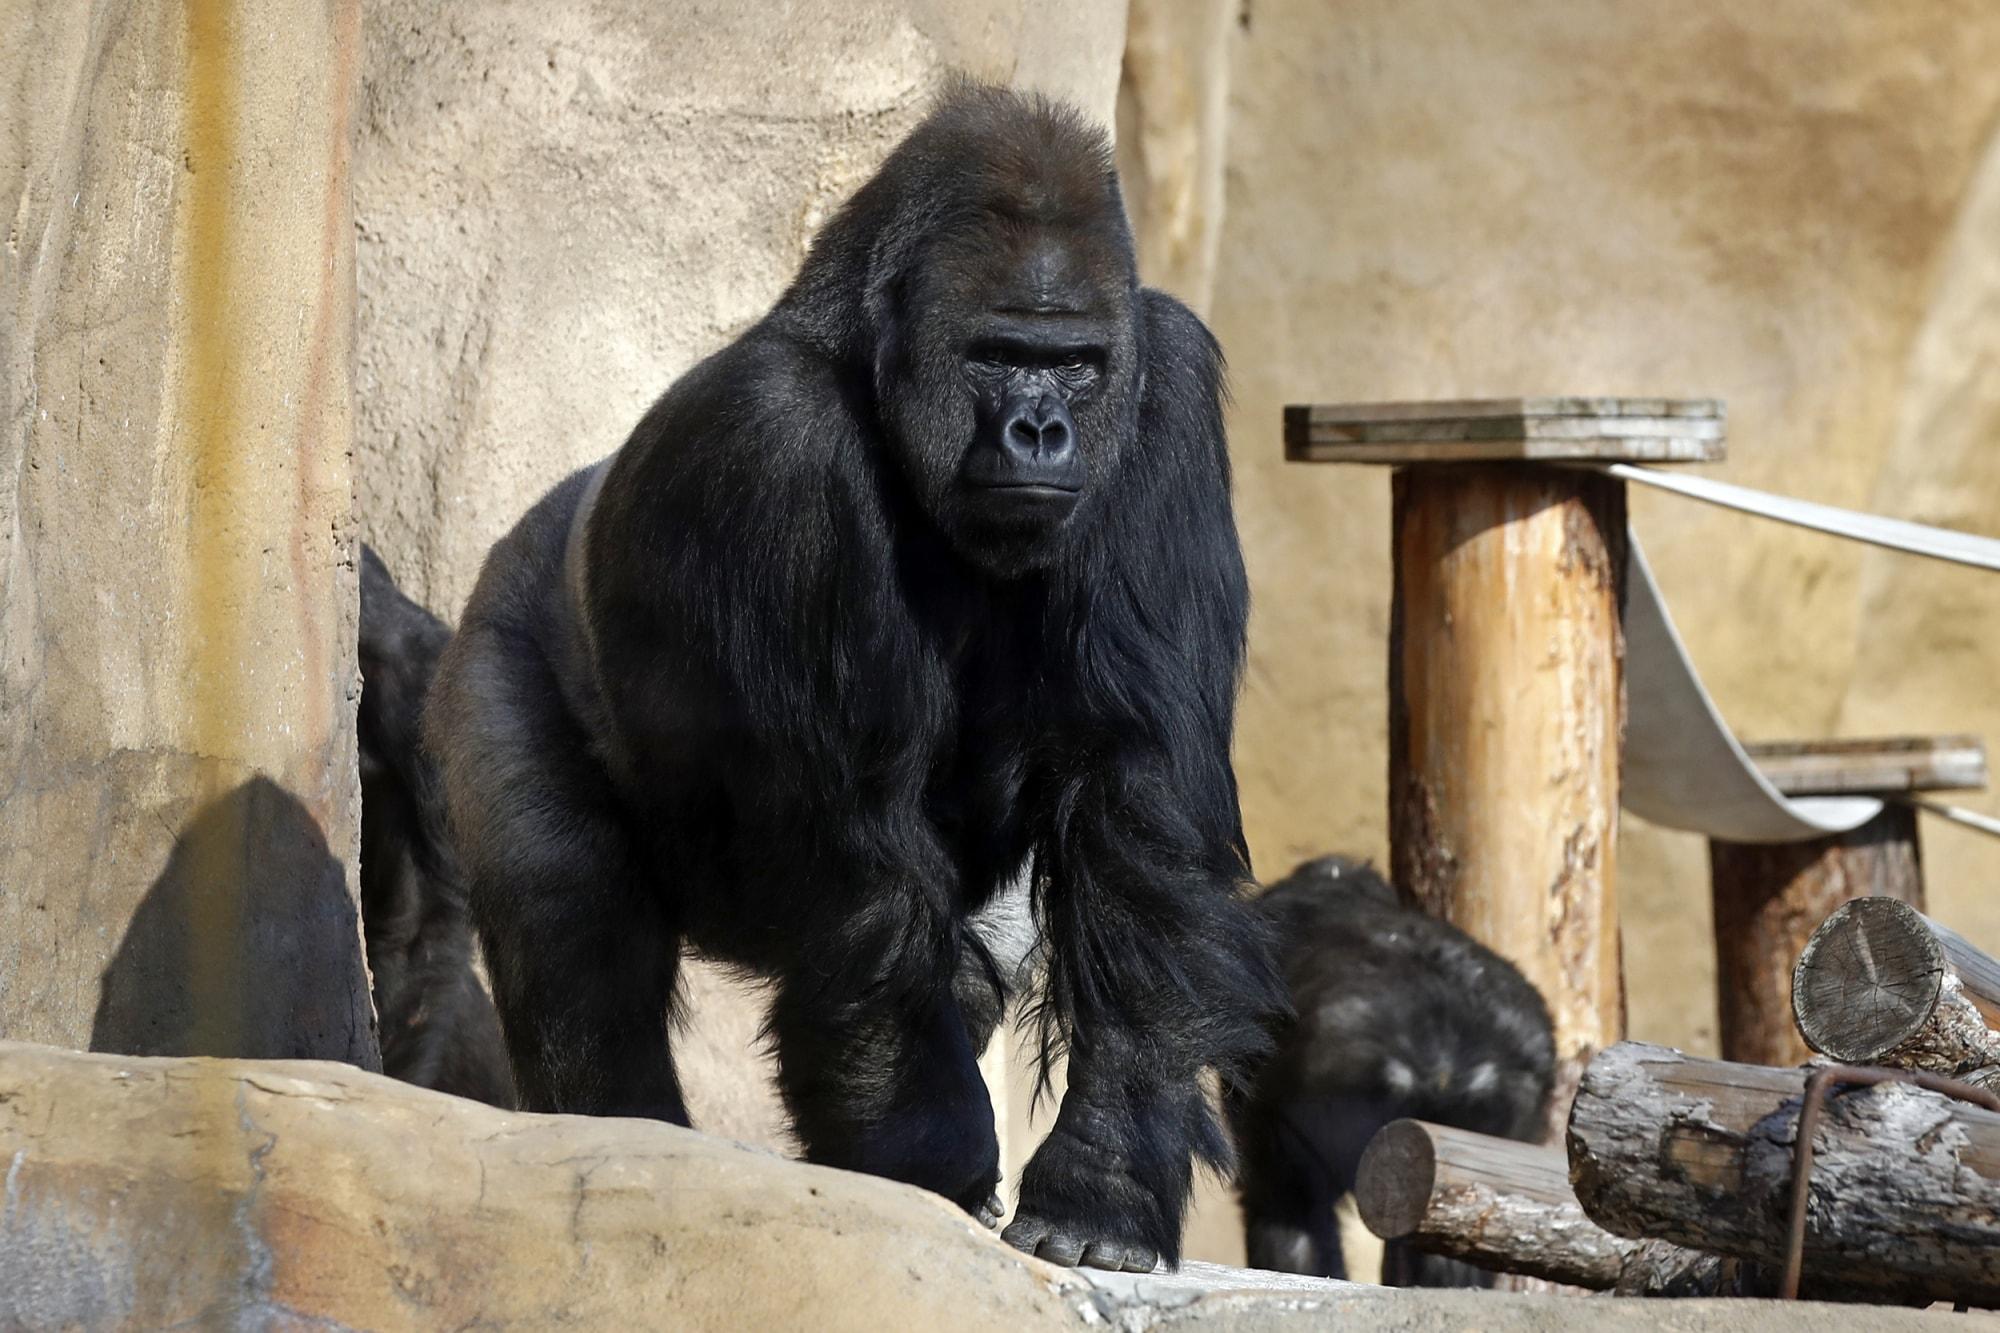 210911-gorilla-zoo-mb-1452.jpg